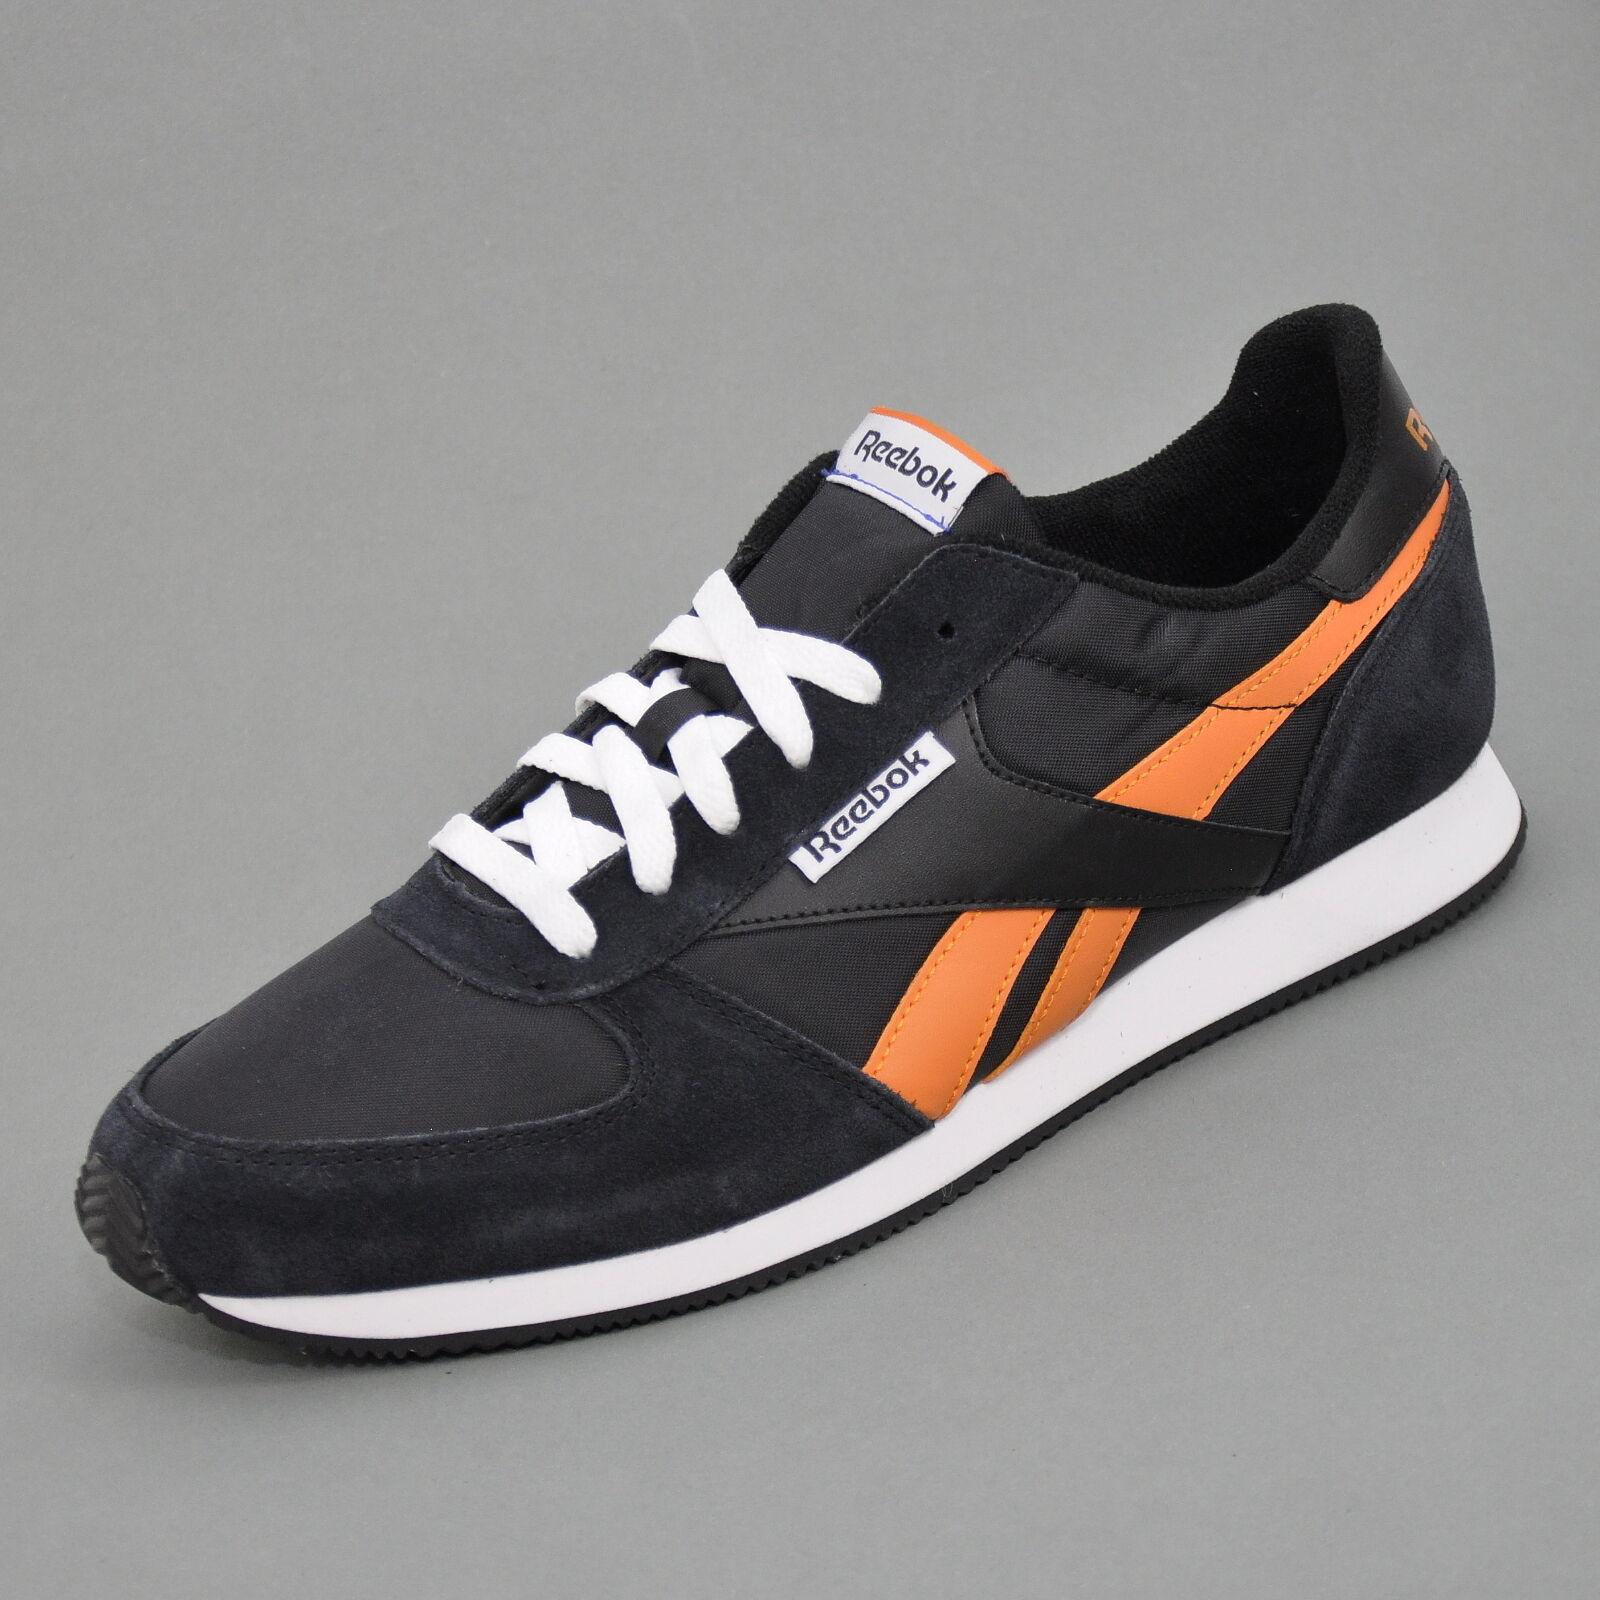 Reebok Royal CL Jogger Herren Sneaker Black/White/Orange J98930